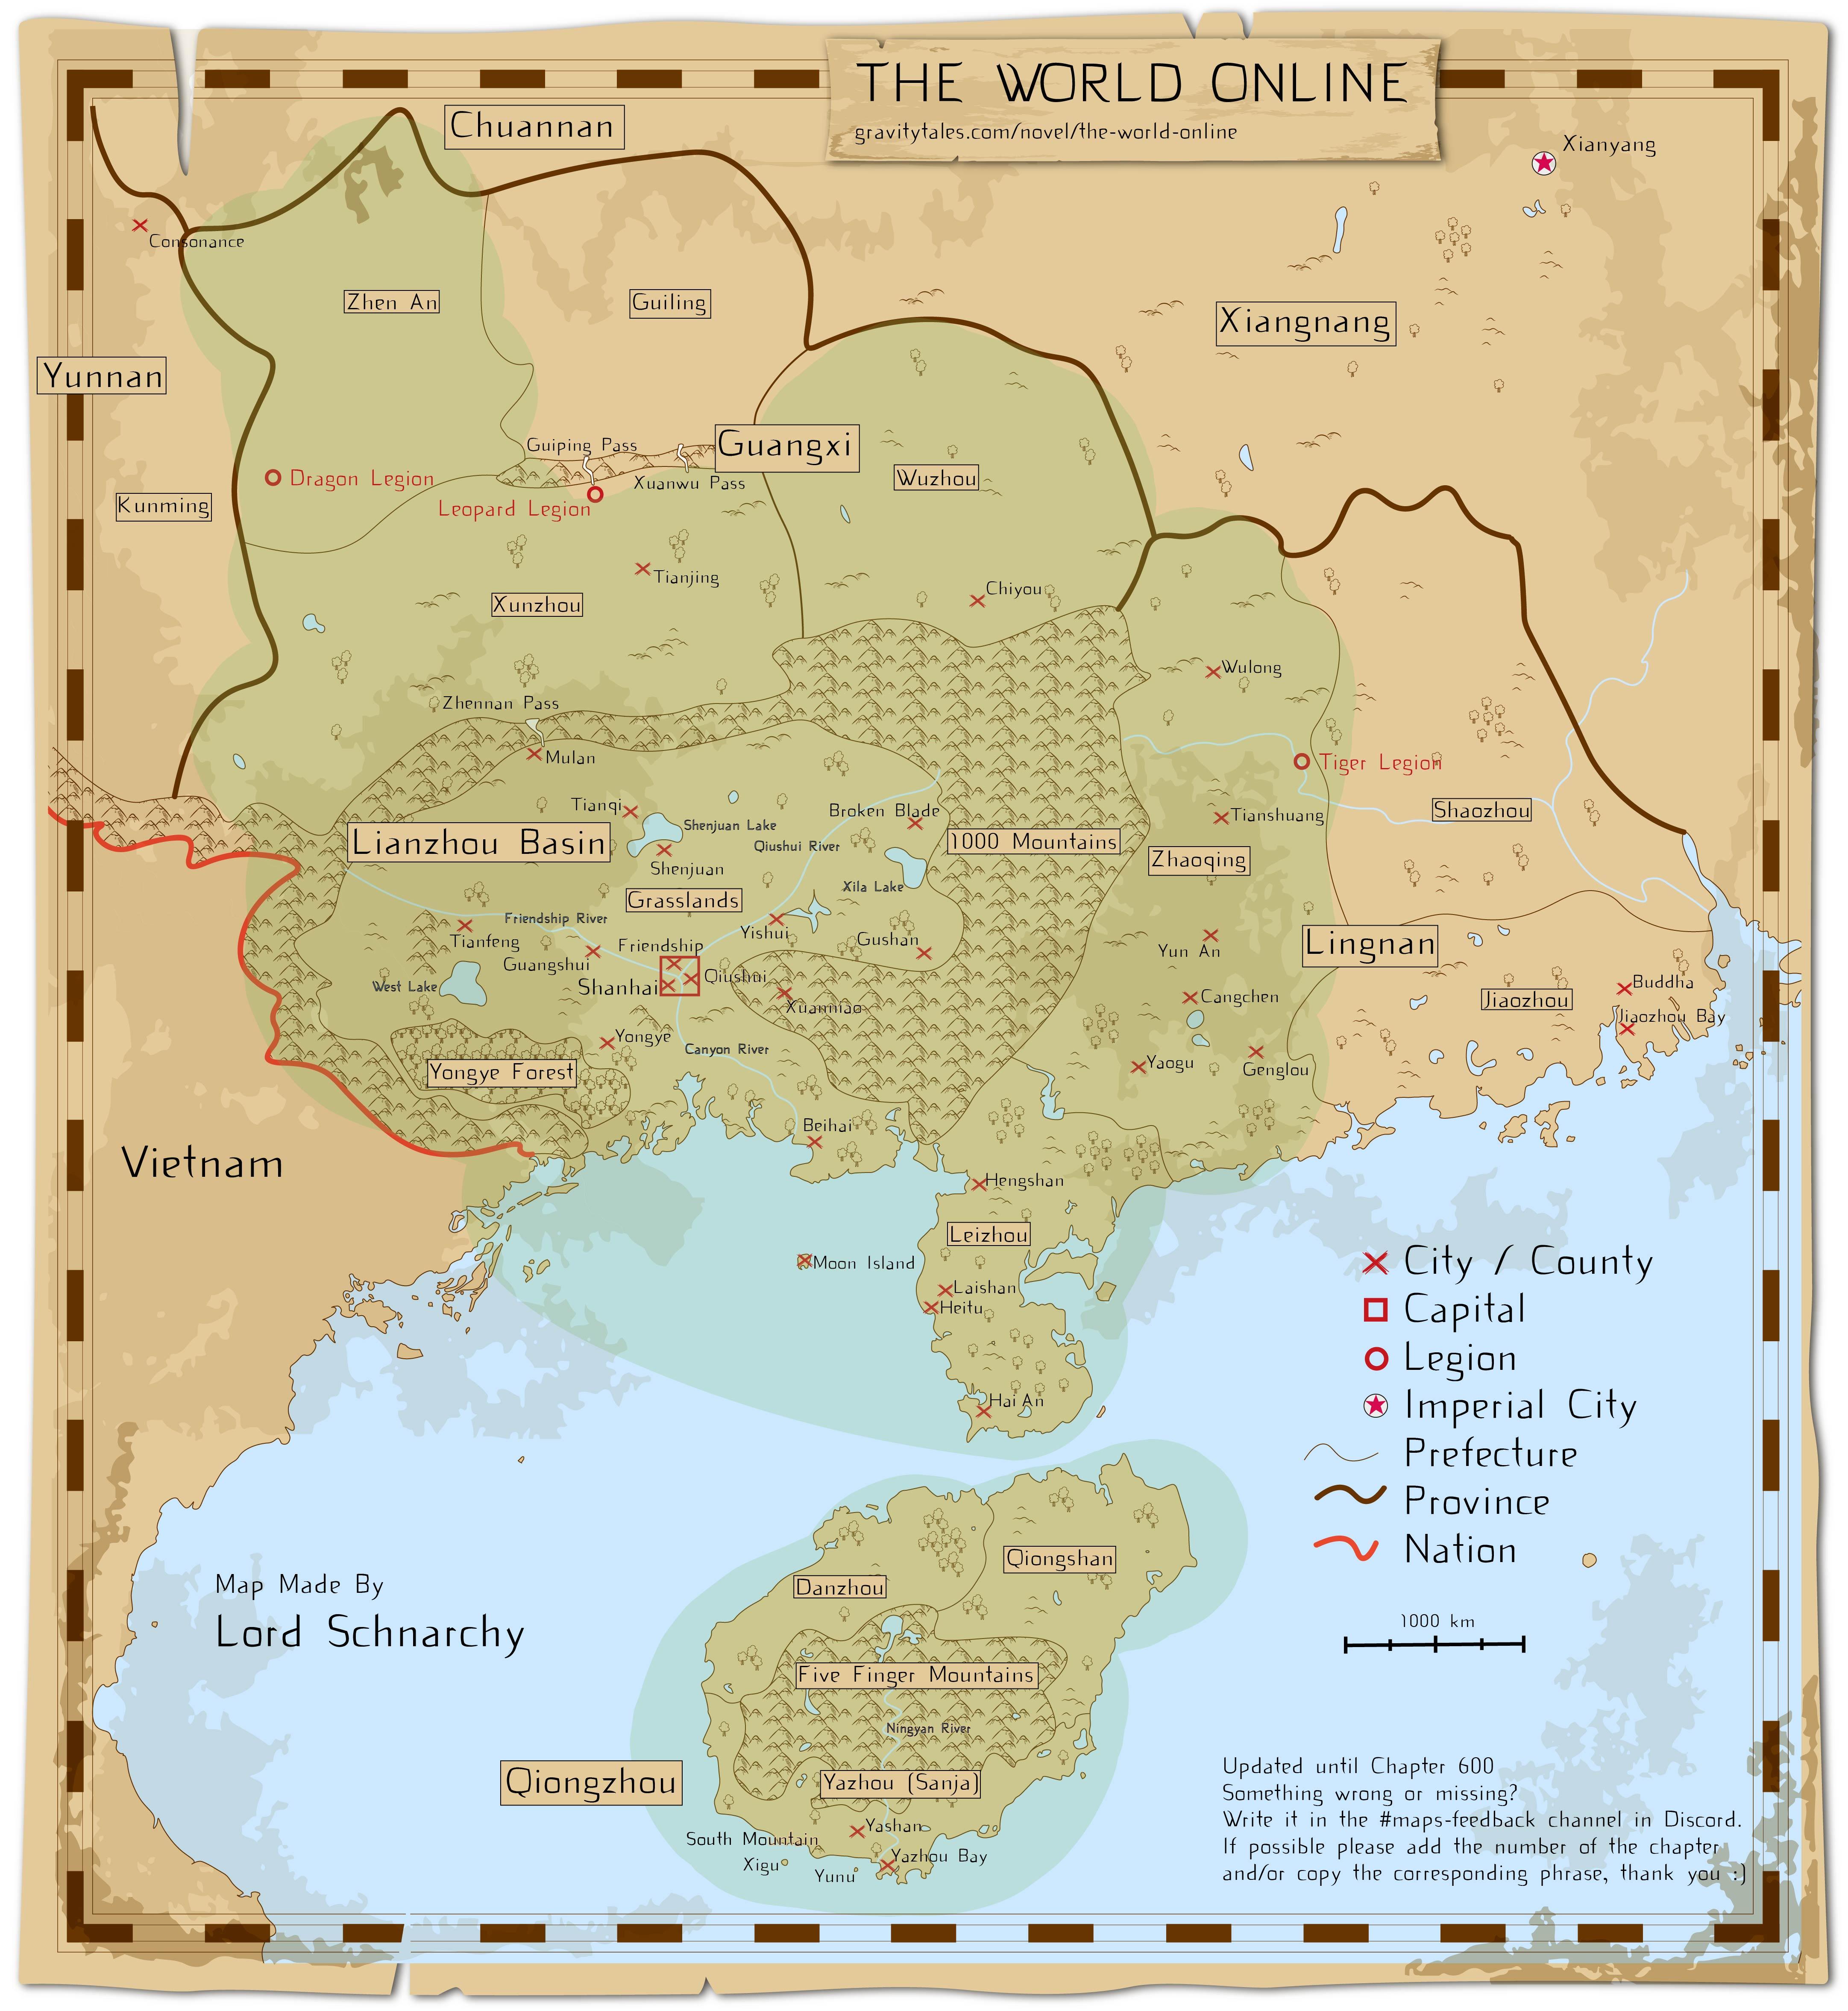 General 4326x4708 The World Online map Light Novel